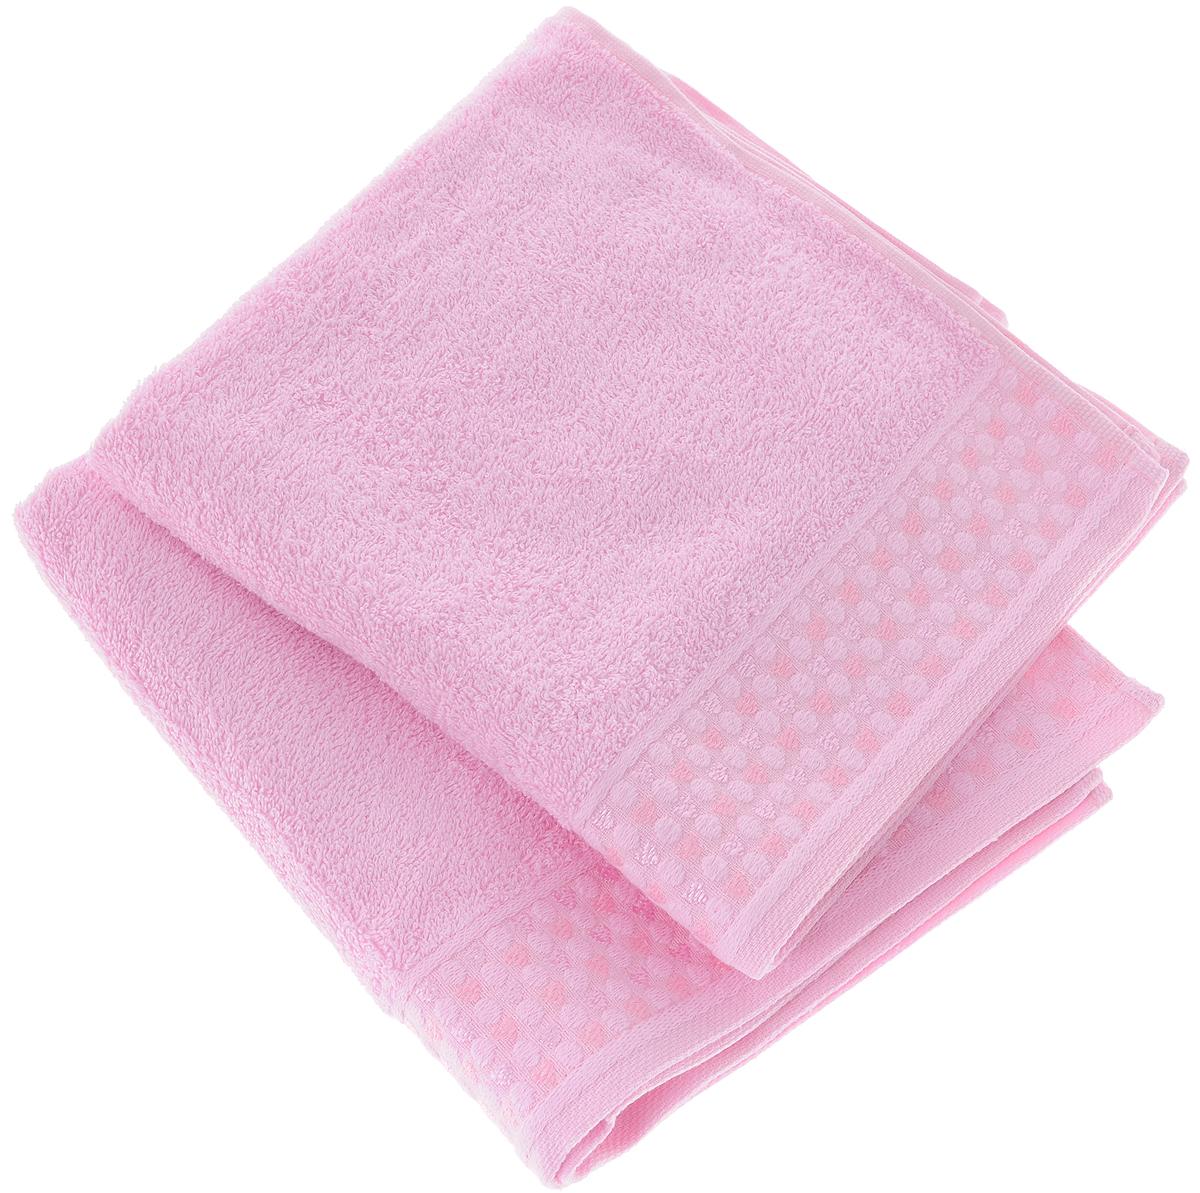 Фото - Набор полотенец Tete-a-Tete Сердечки, цвет: розовый, 2 шт. УНП-104-04к набор полотенец tete a tete лабиринт цвет зеленый 50 х 90 см 2 шт уп 009